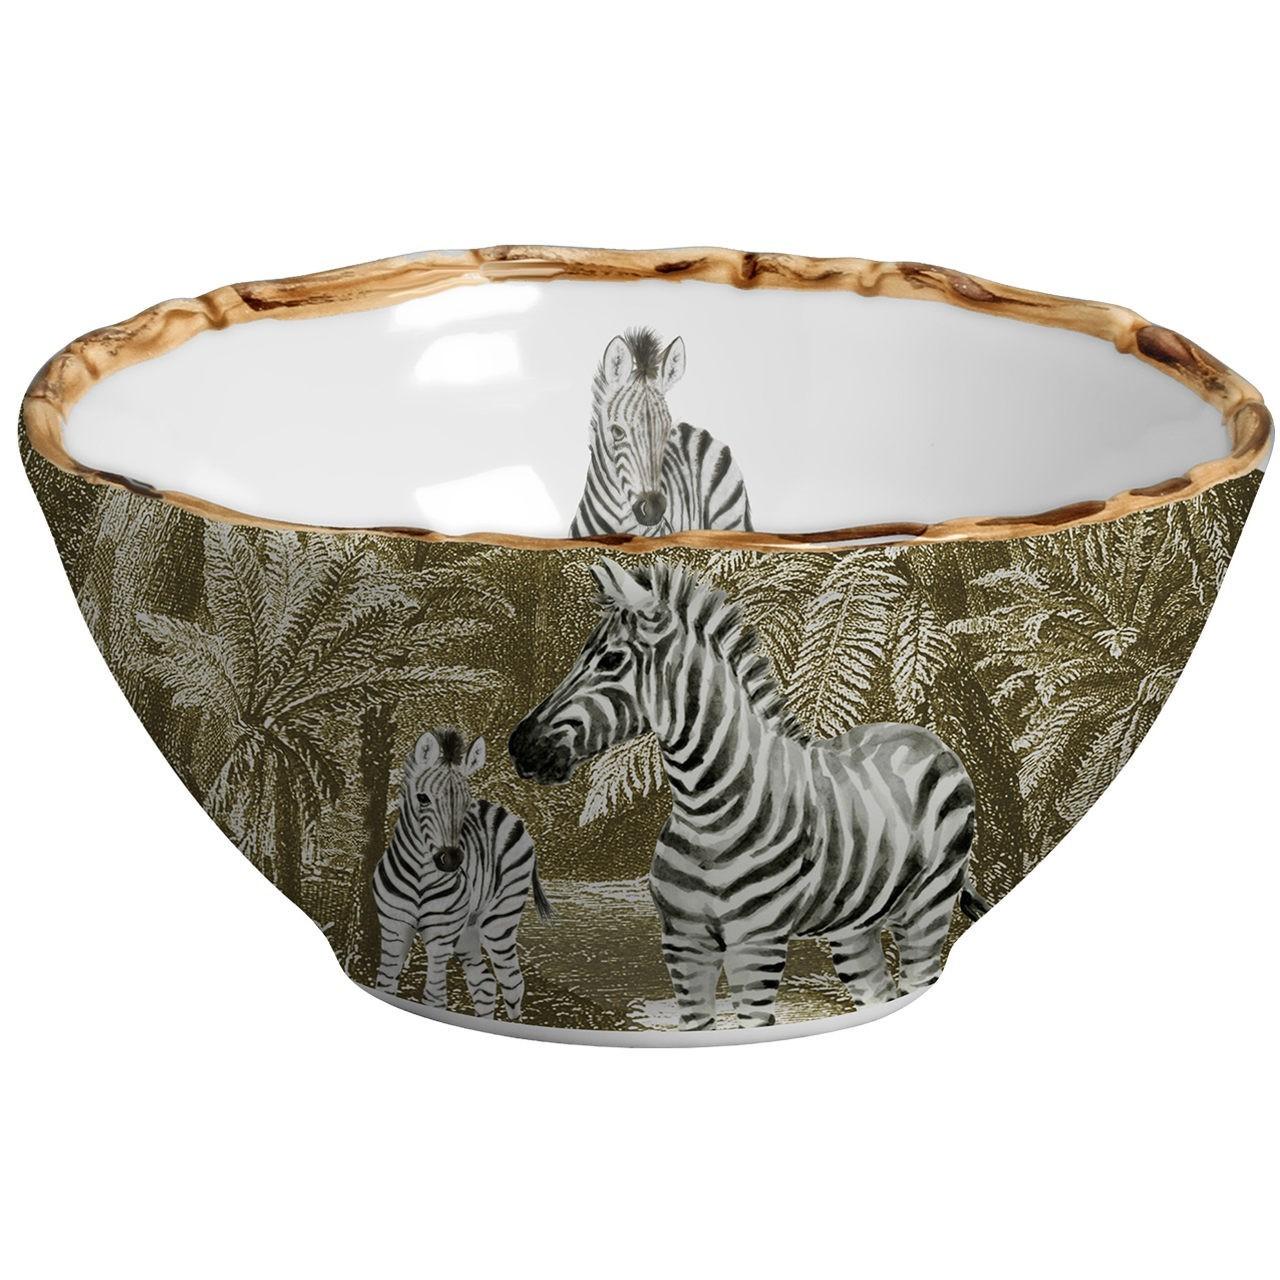 Bowl Zebra African Toile (06 Unidades) Cód.: 6074 - MB